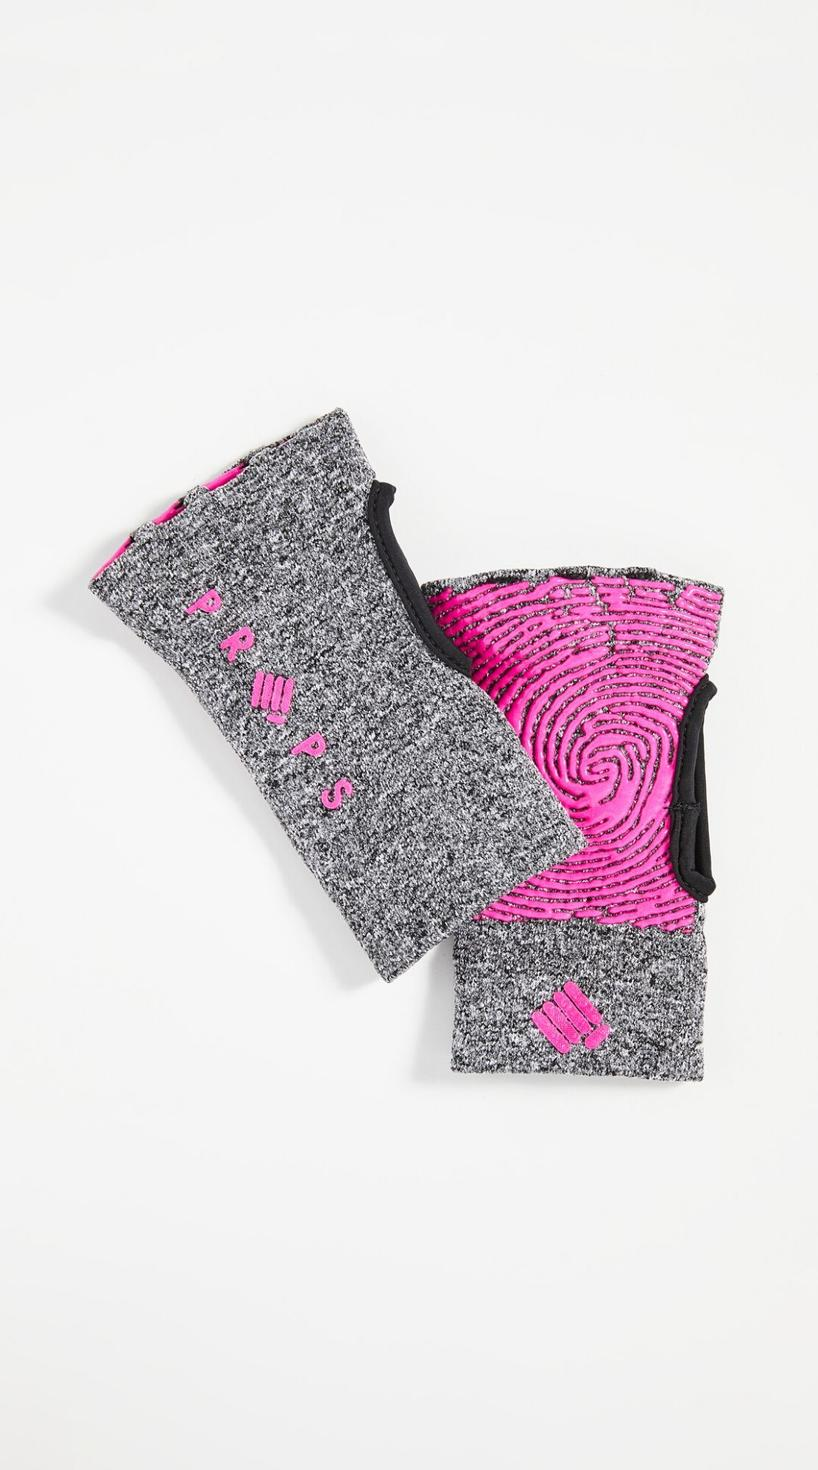 Modest activewear, Modest sports clothes, Activewear, Sports hijab, Nike Hijab